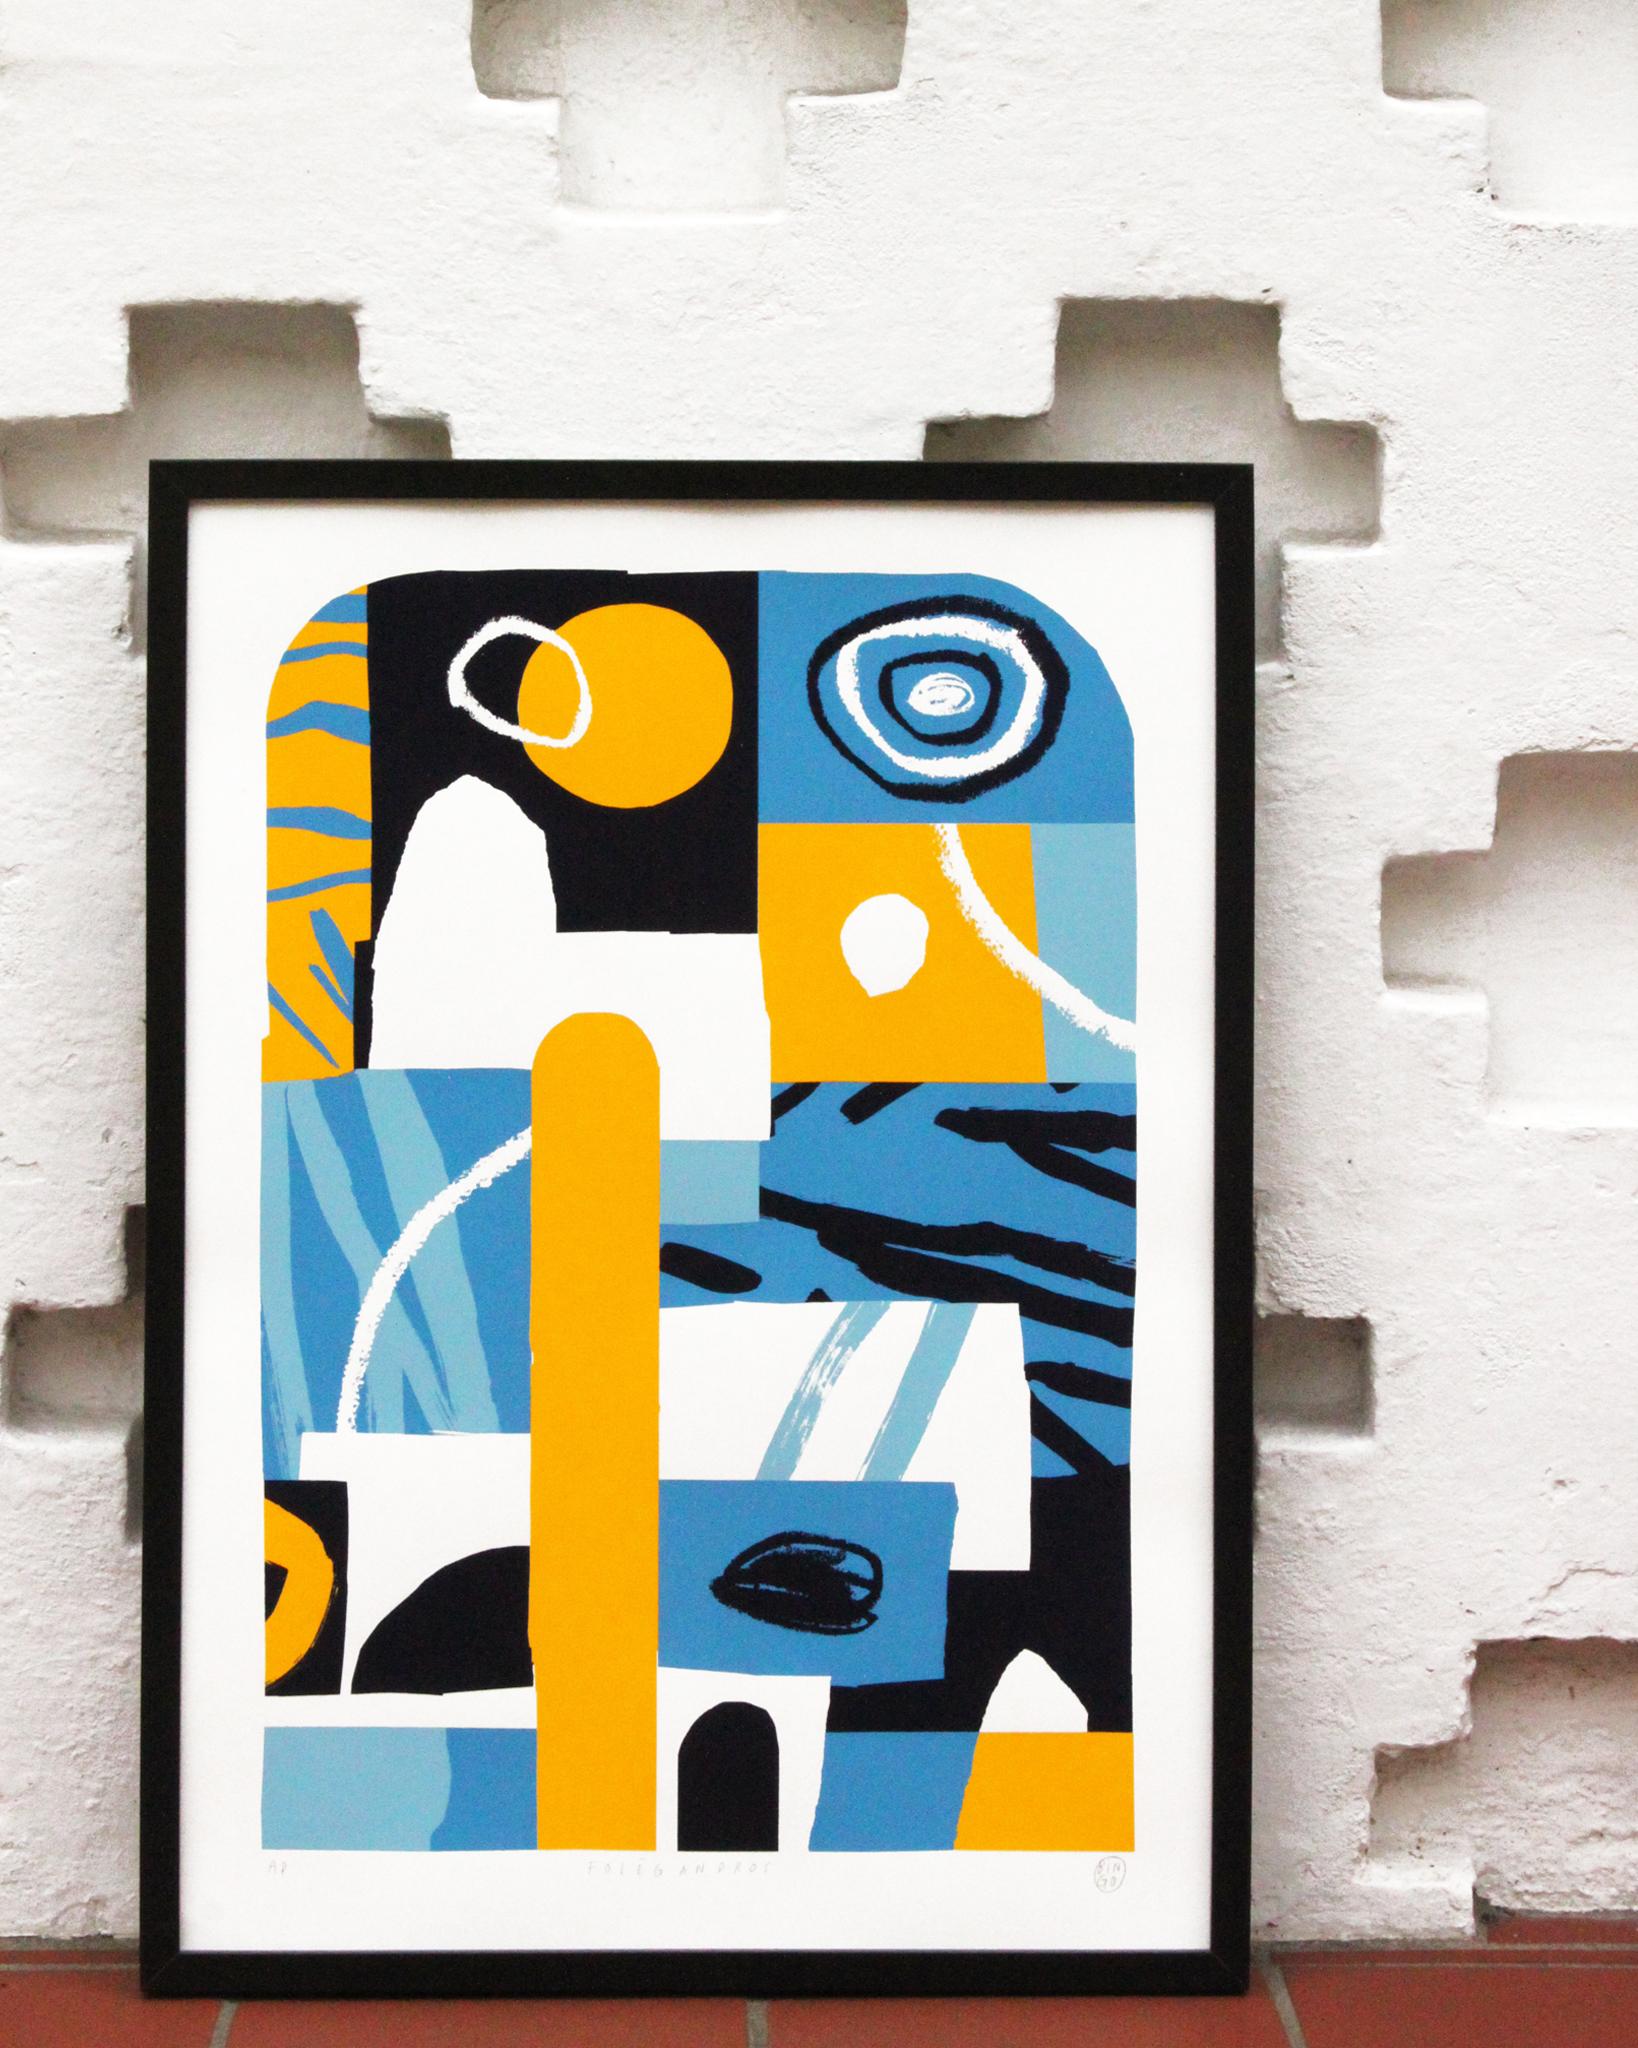 The Jaunt #46 - Atelier Bingo Silkscreen Print, 50cm x 70cm, Edition of 50, 2018 http://www.thejaunt.net/printarchive/046-atelierbingo